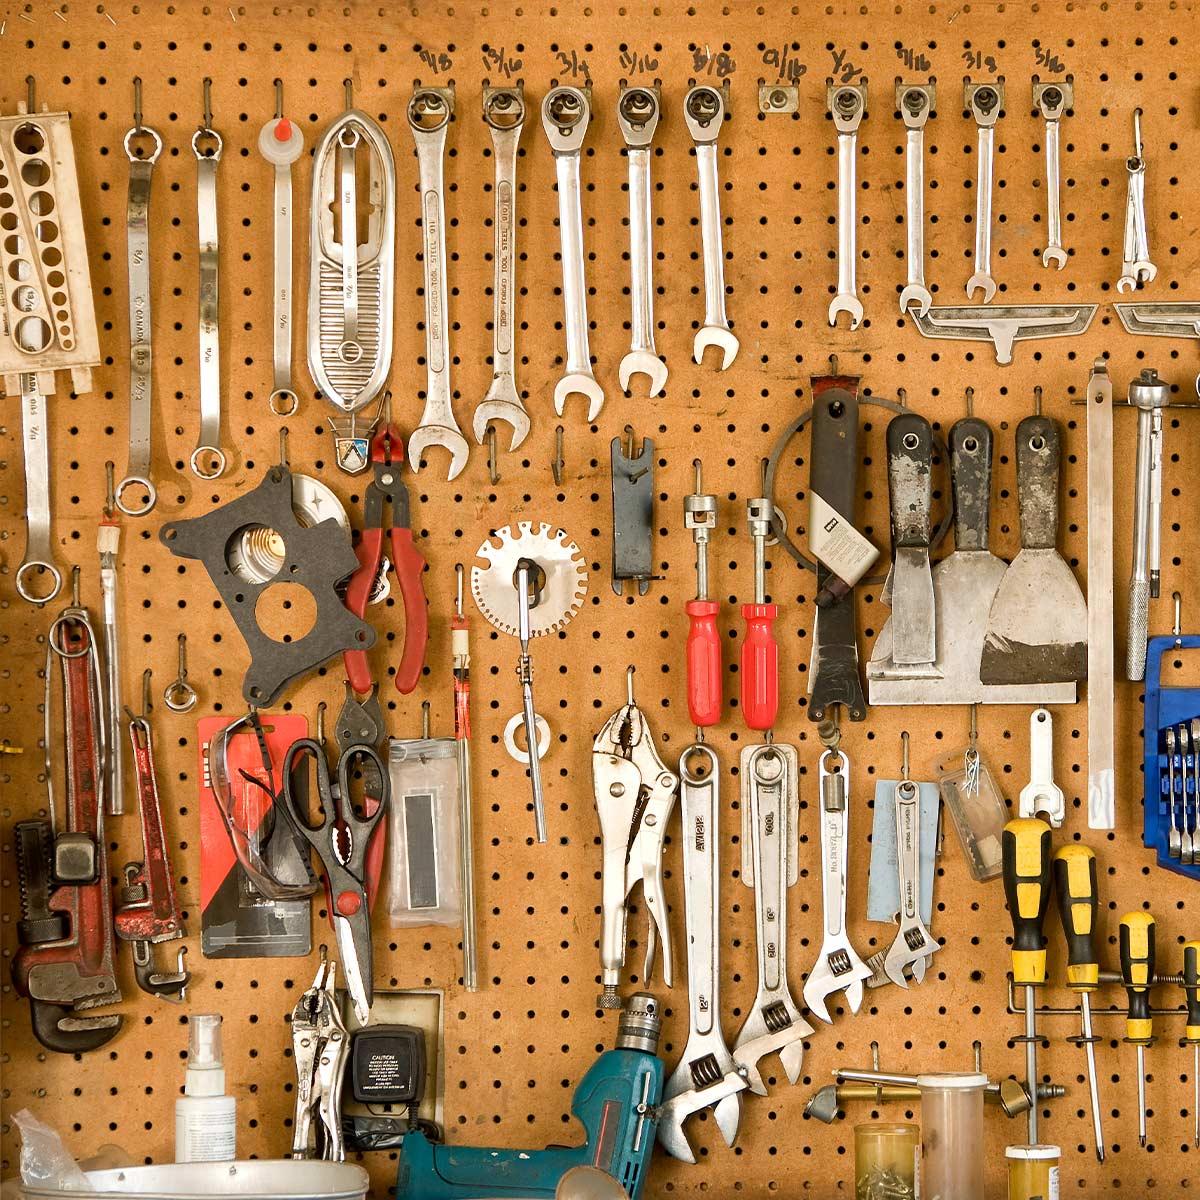 Organized garage tools on pegboard.